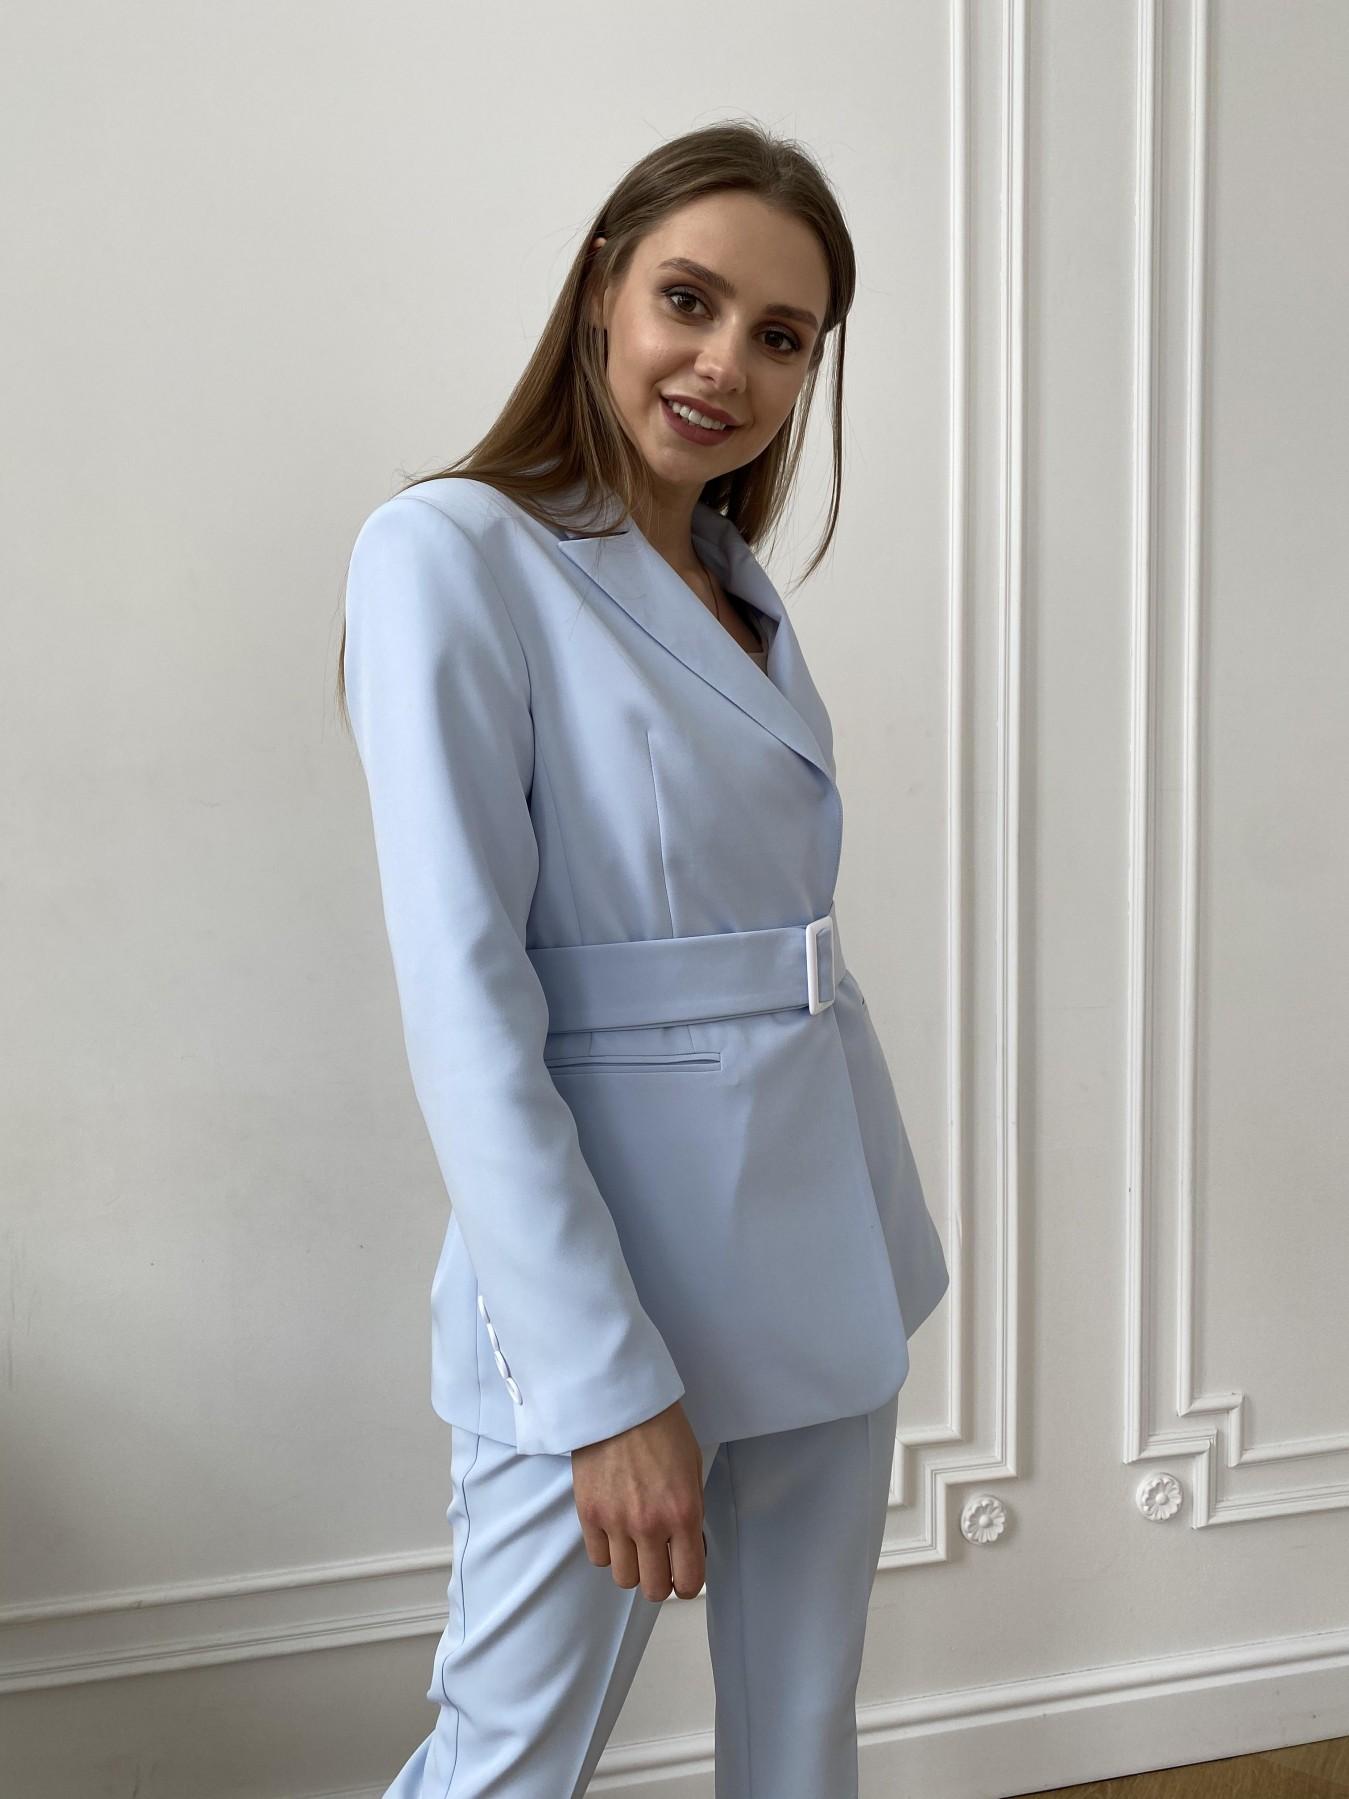 Китон жакет  костюмка стрейч 11131 АРТ. 47629 Цвет: Голубой - фото 7, интернет магазин tm-modus.ru